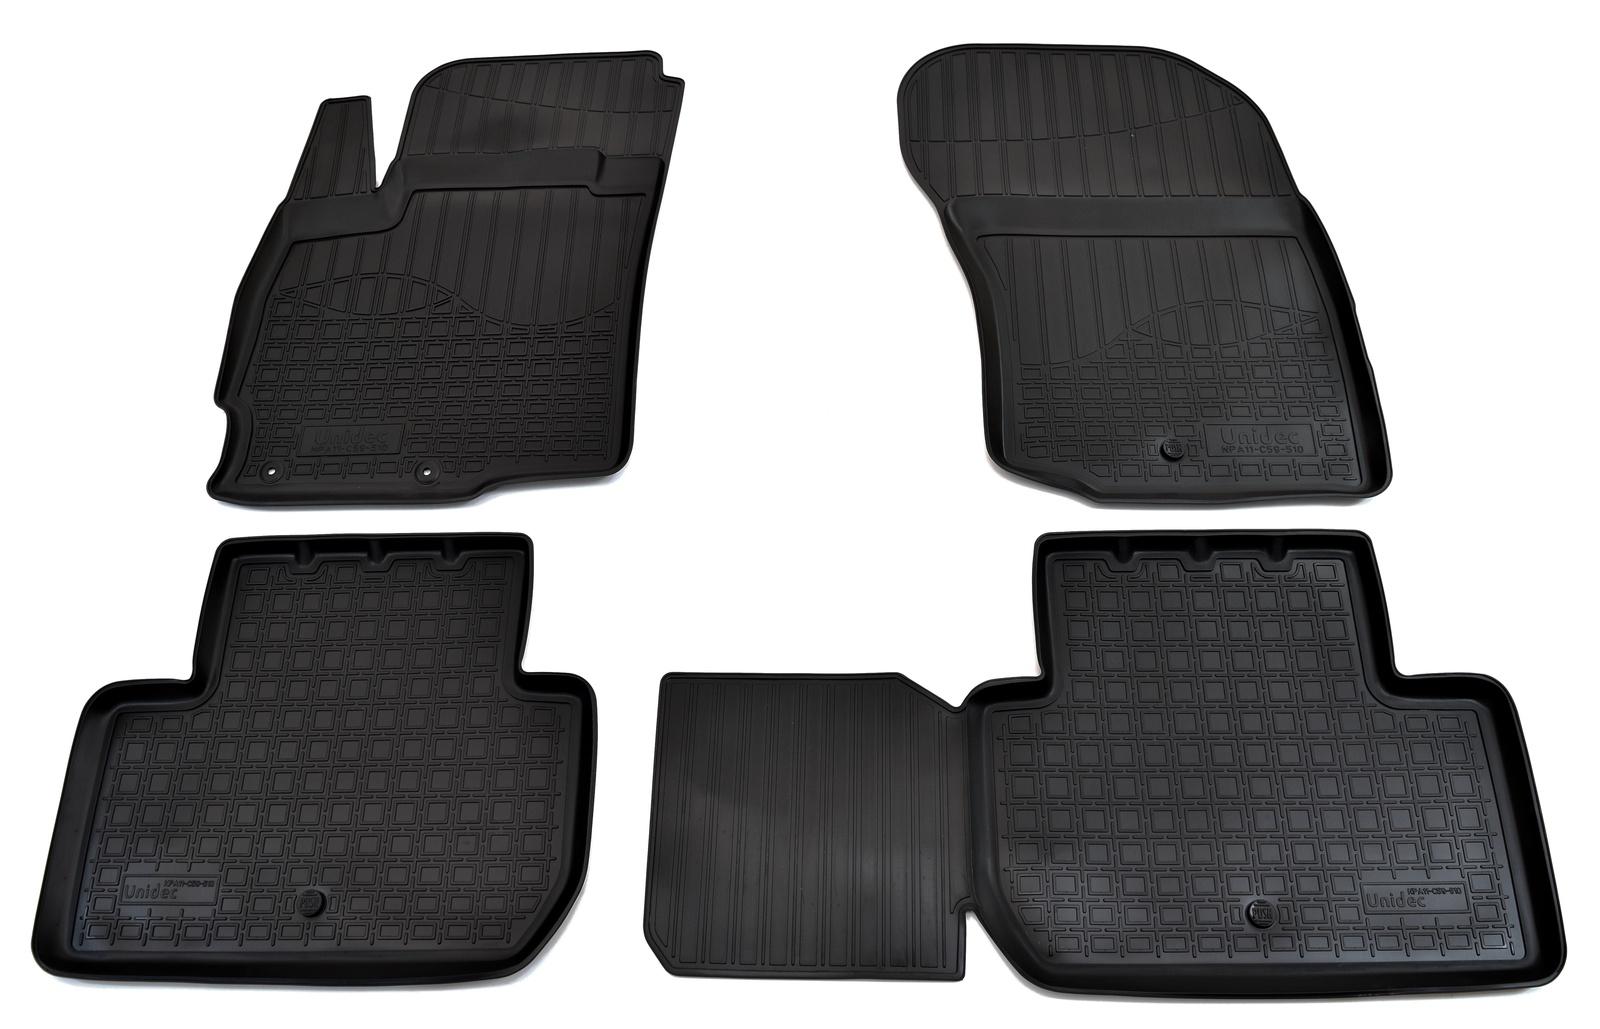 цена на Коврики в салон автомобиля Norplast для Mitsubishi Outlander (2012), NPA11-C59-510, черный